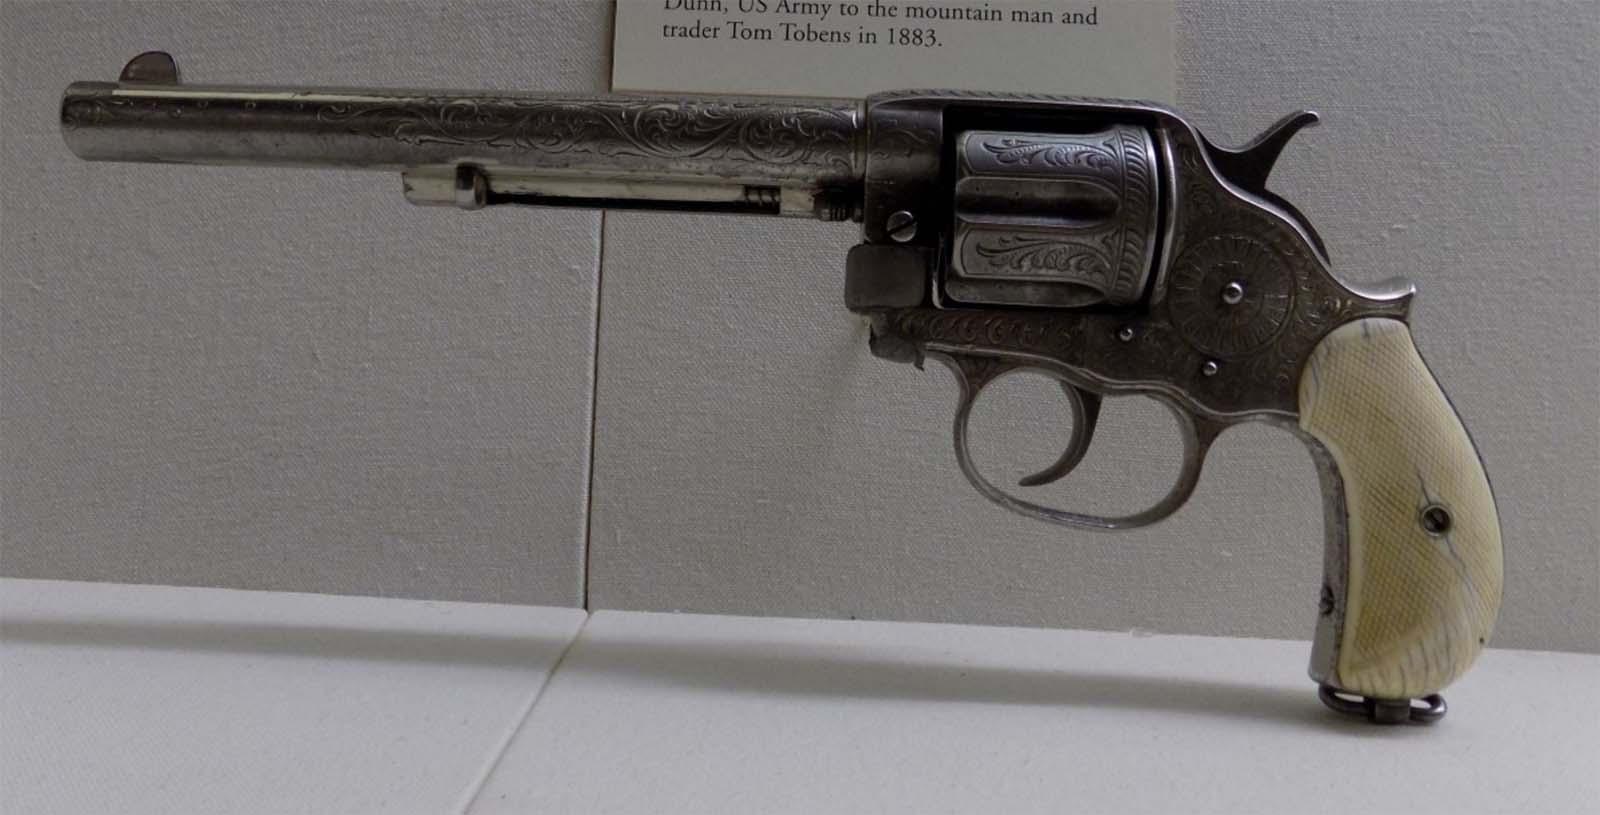 1887 Frontier Revolver presented to Tom Tobin. 2003.10.1